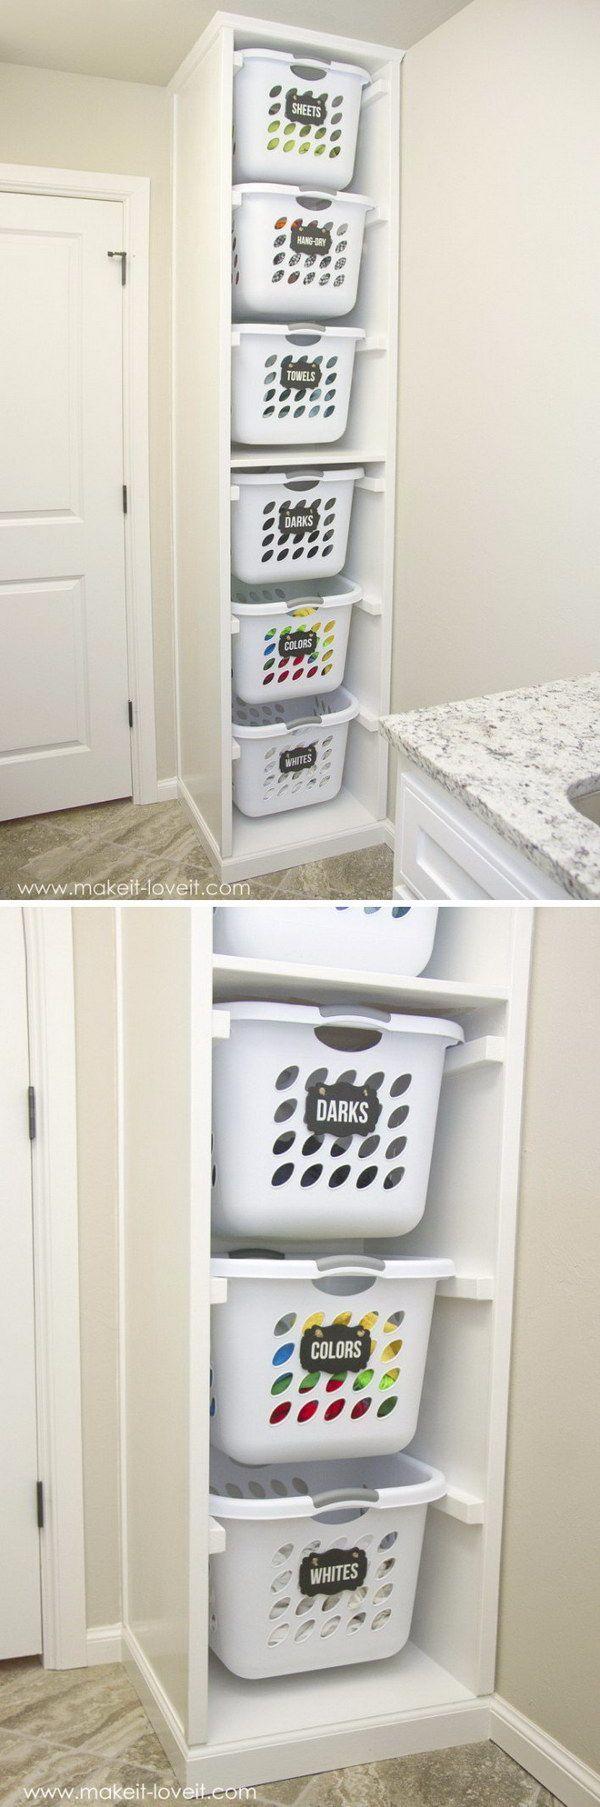 DIY Laundry Basket Organizer.